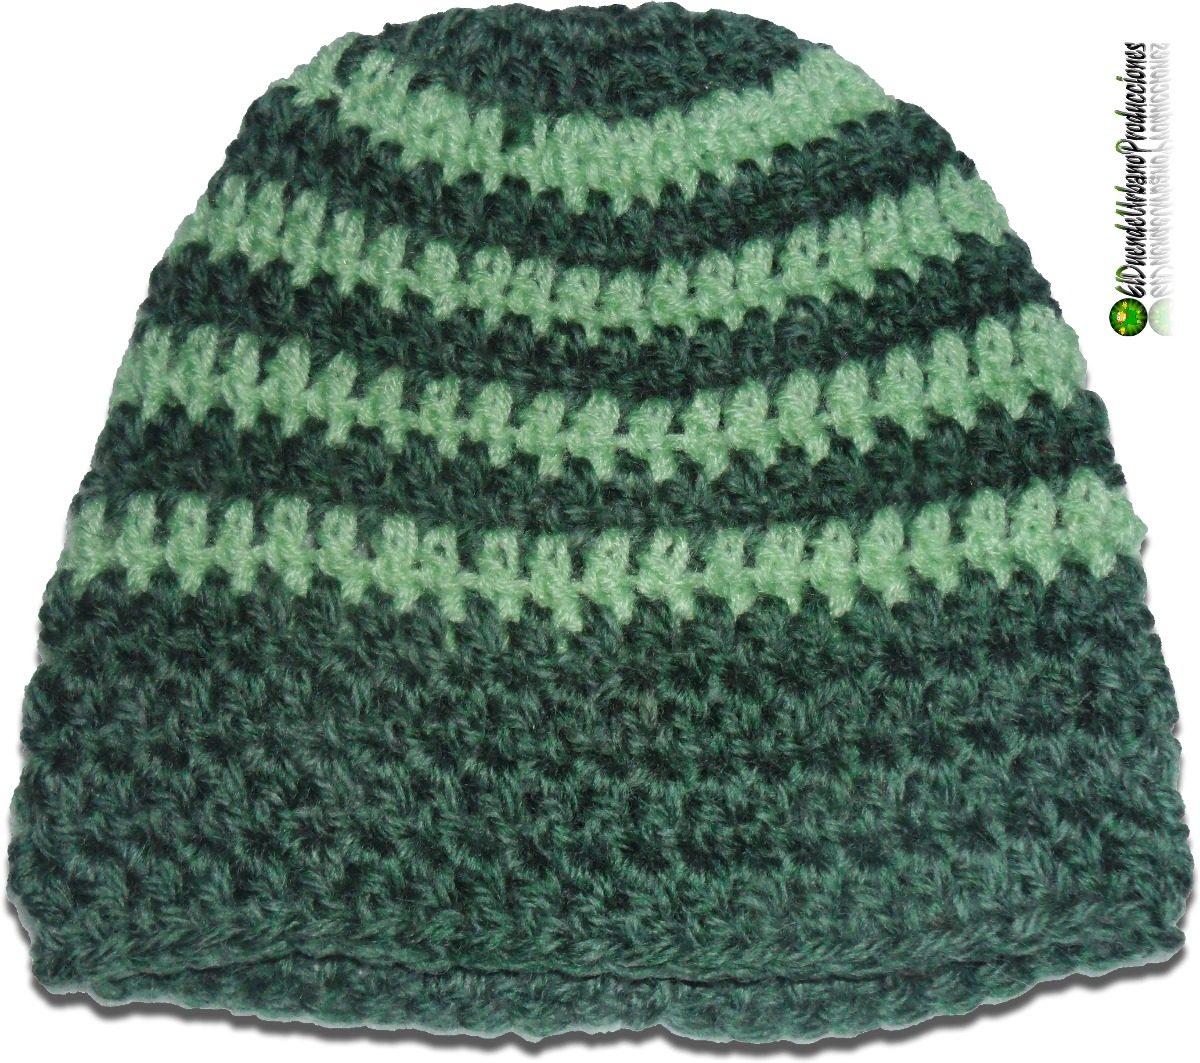 b27535e36 gorros infantiles tejidos crochet unisex mod. verde + rayas. Cargando zoom.